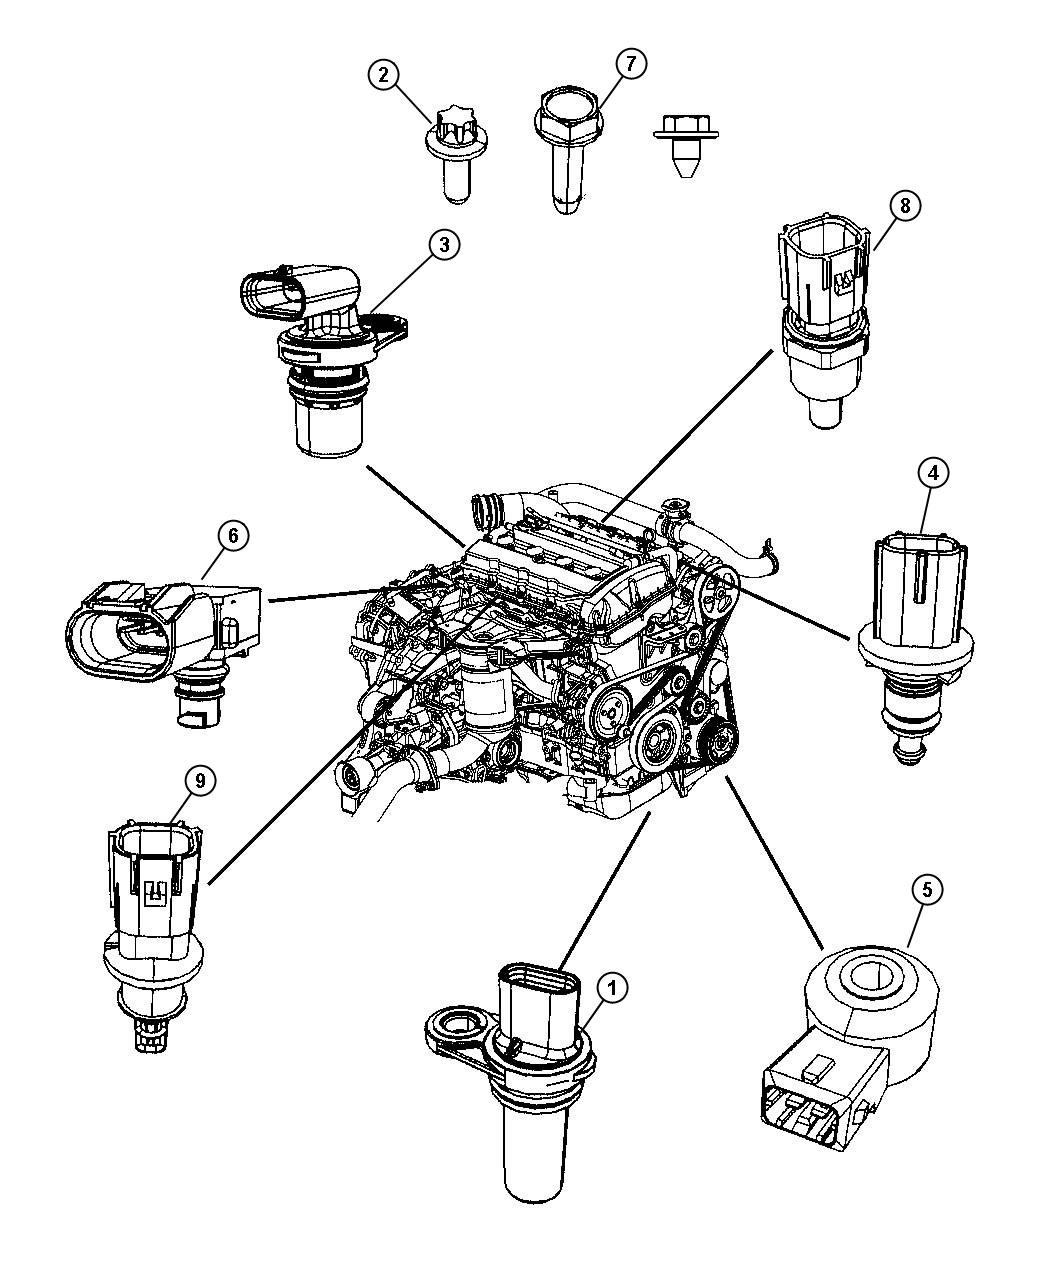 hight resolution of wiring diagram for 2001 dodge caravan 2 4l